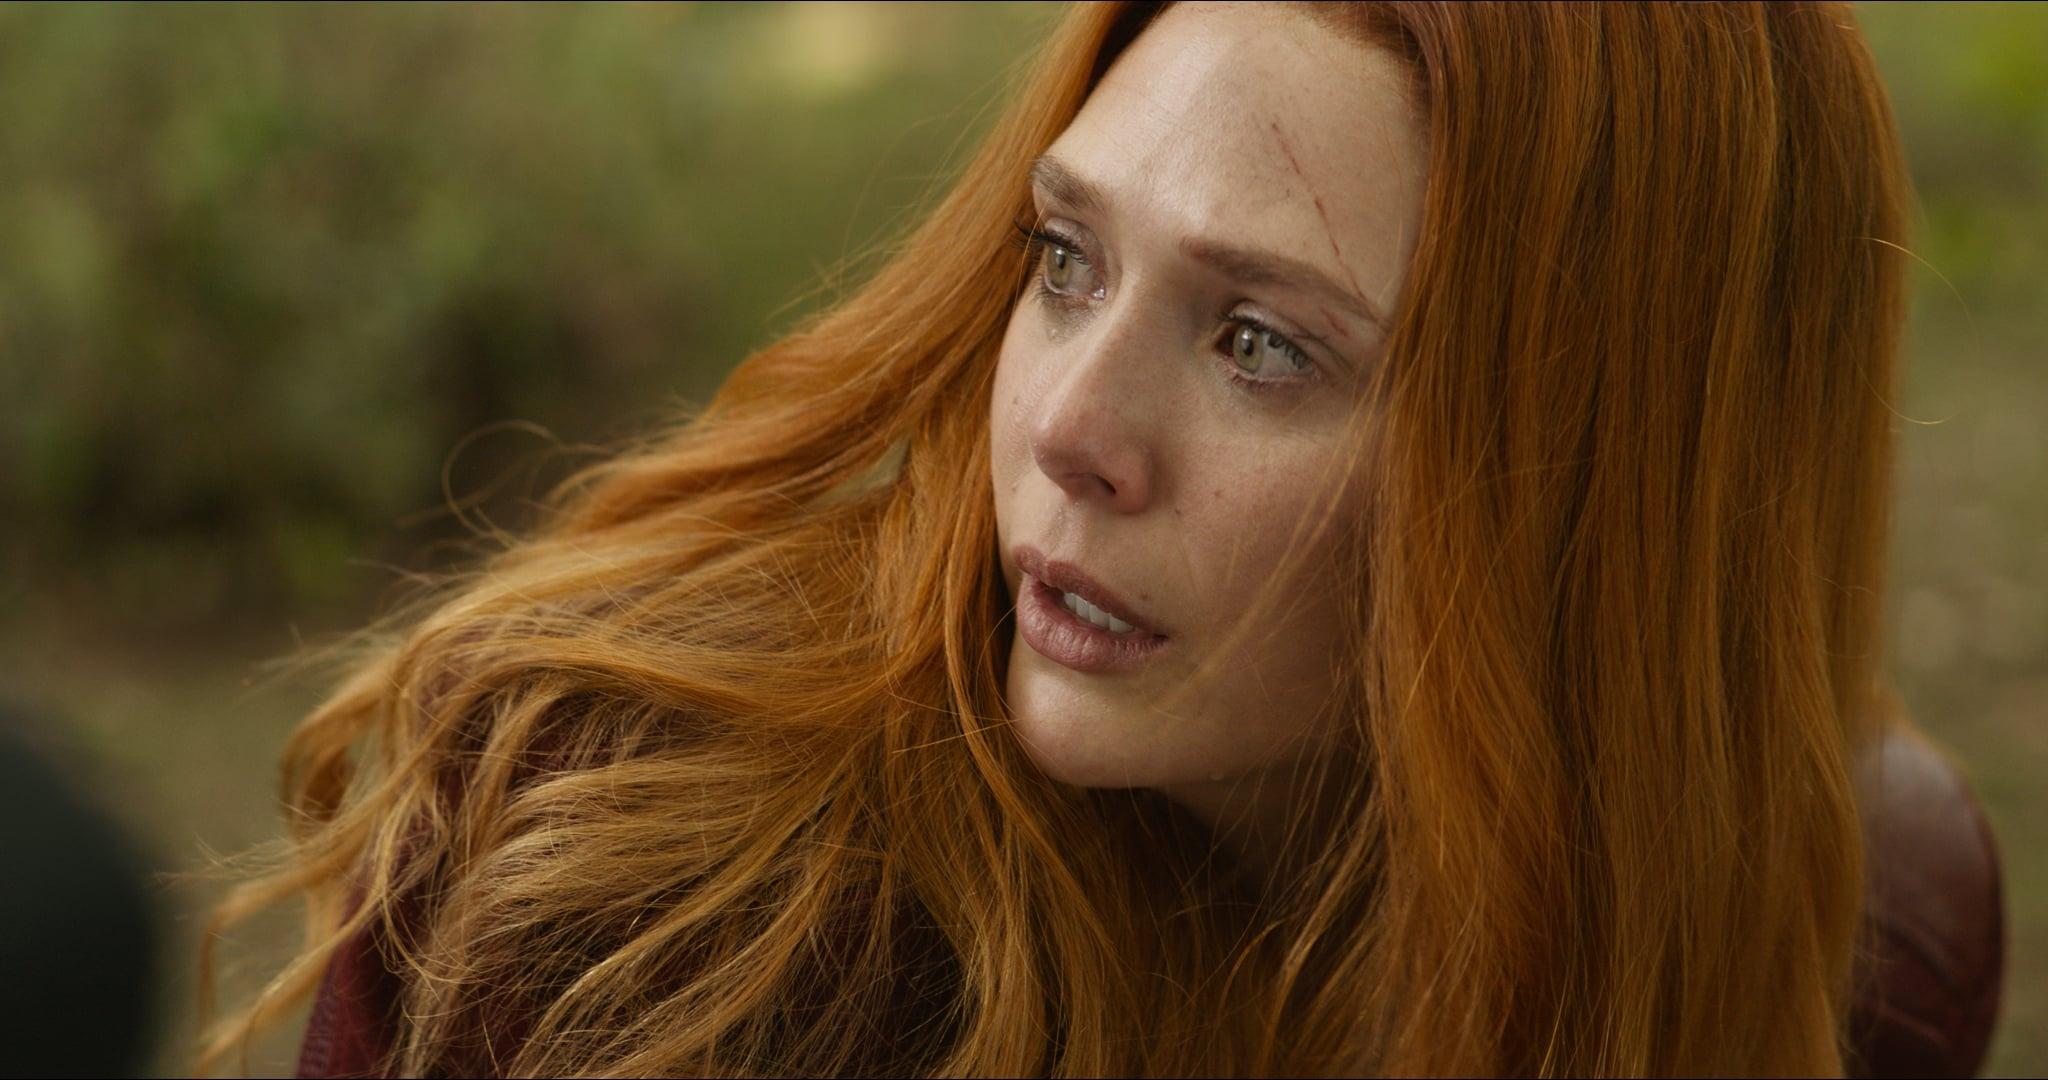 Marvel Studios' AVENGERS: INFINITY WAR..Scarlet Witch/Wanda Maximoff (Elizabeth Olsen)..Photo: Film Frame..©Marvel Studios 2018